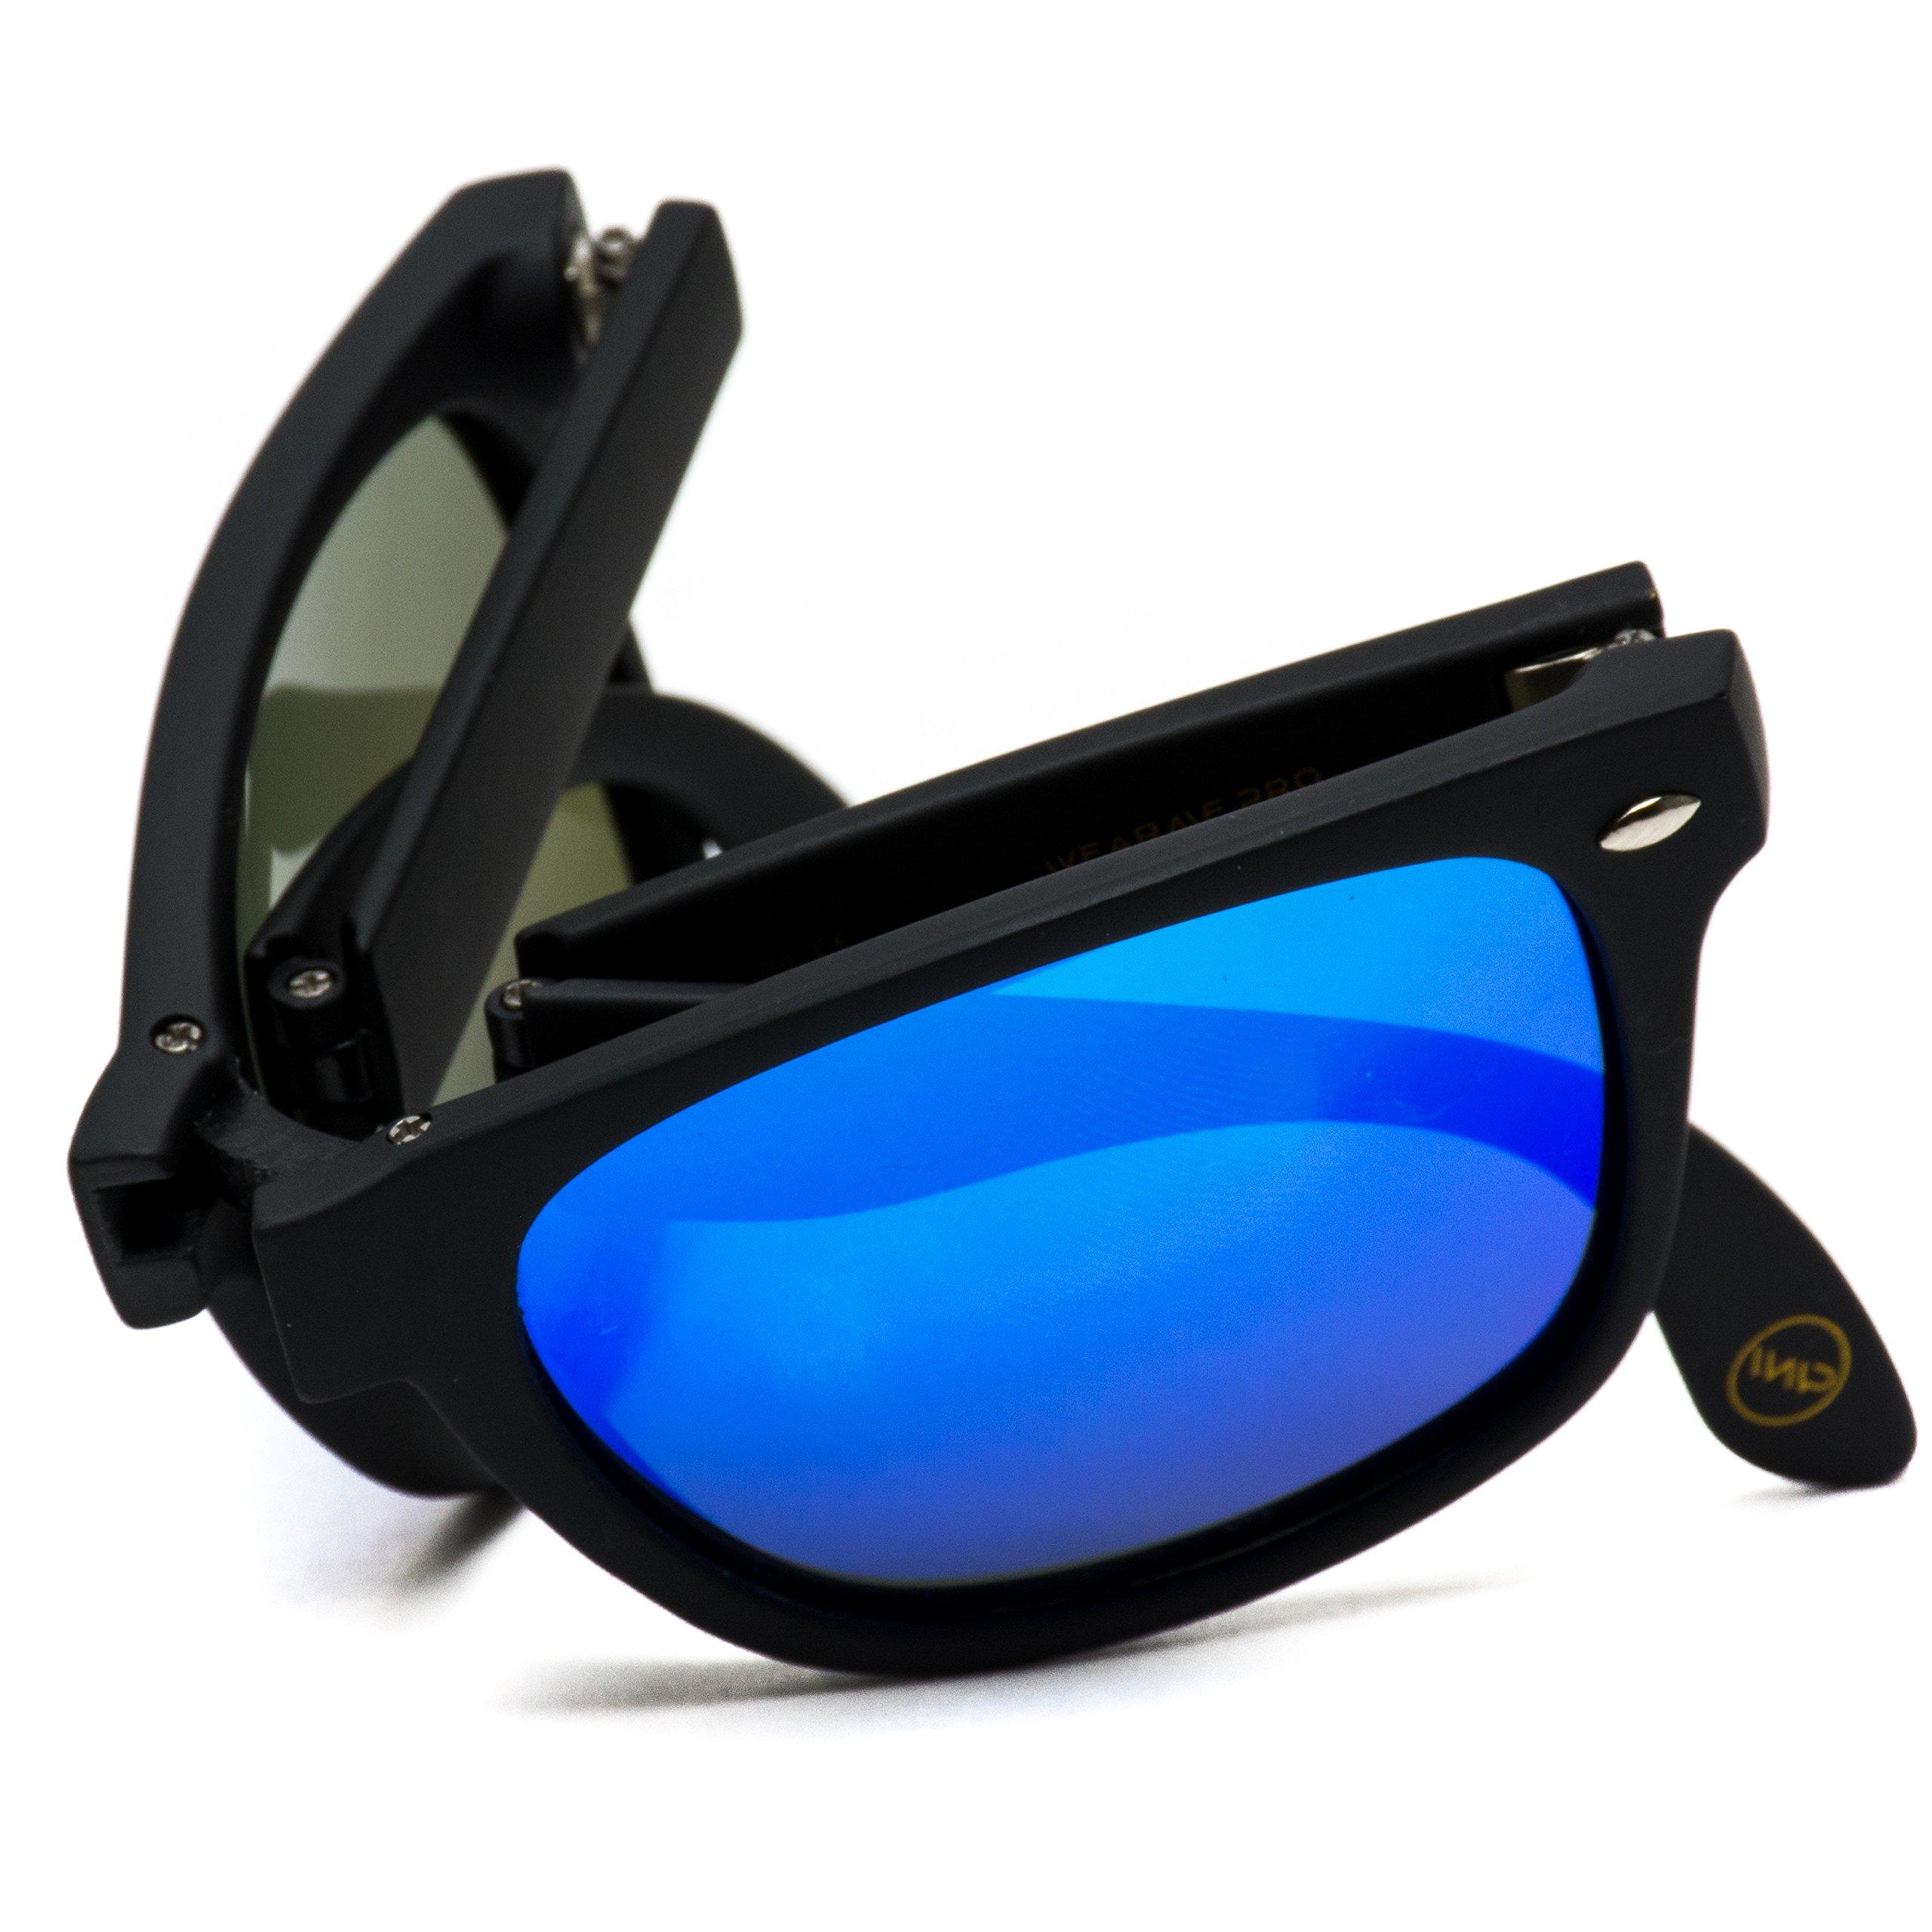 Modern Black Wayfarer Foldable Sunglasses with Case (Black Frame/Mirror Blue Lens)